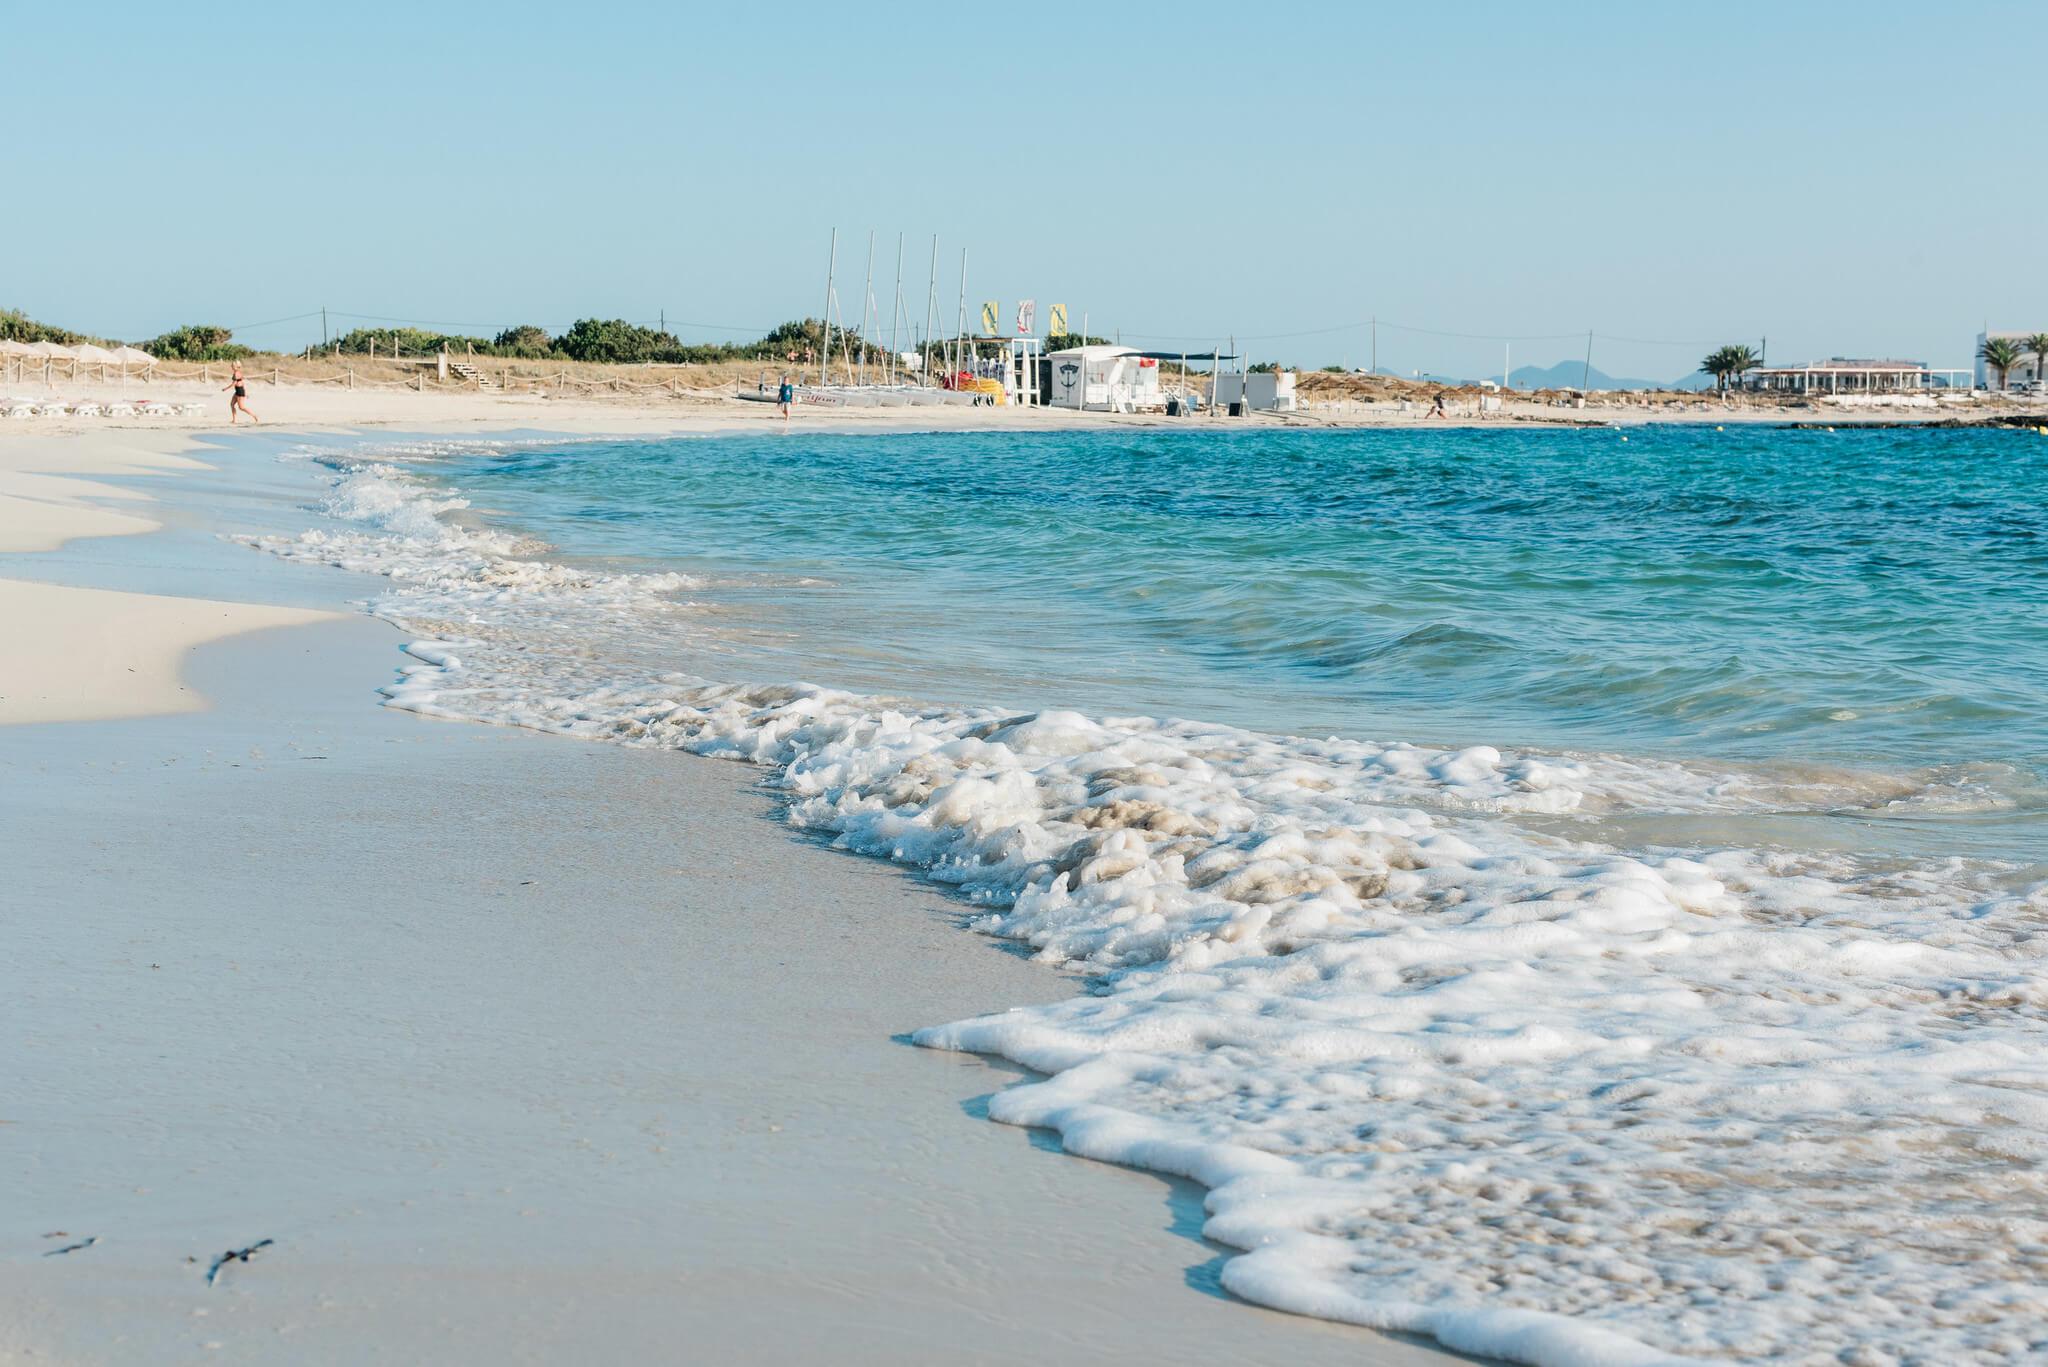 https://www.white-ibiza.com/wp-content/uploads/2020/03/formentera-beaches-es-pujols-2020-07.jpg